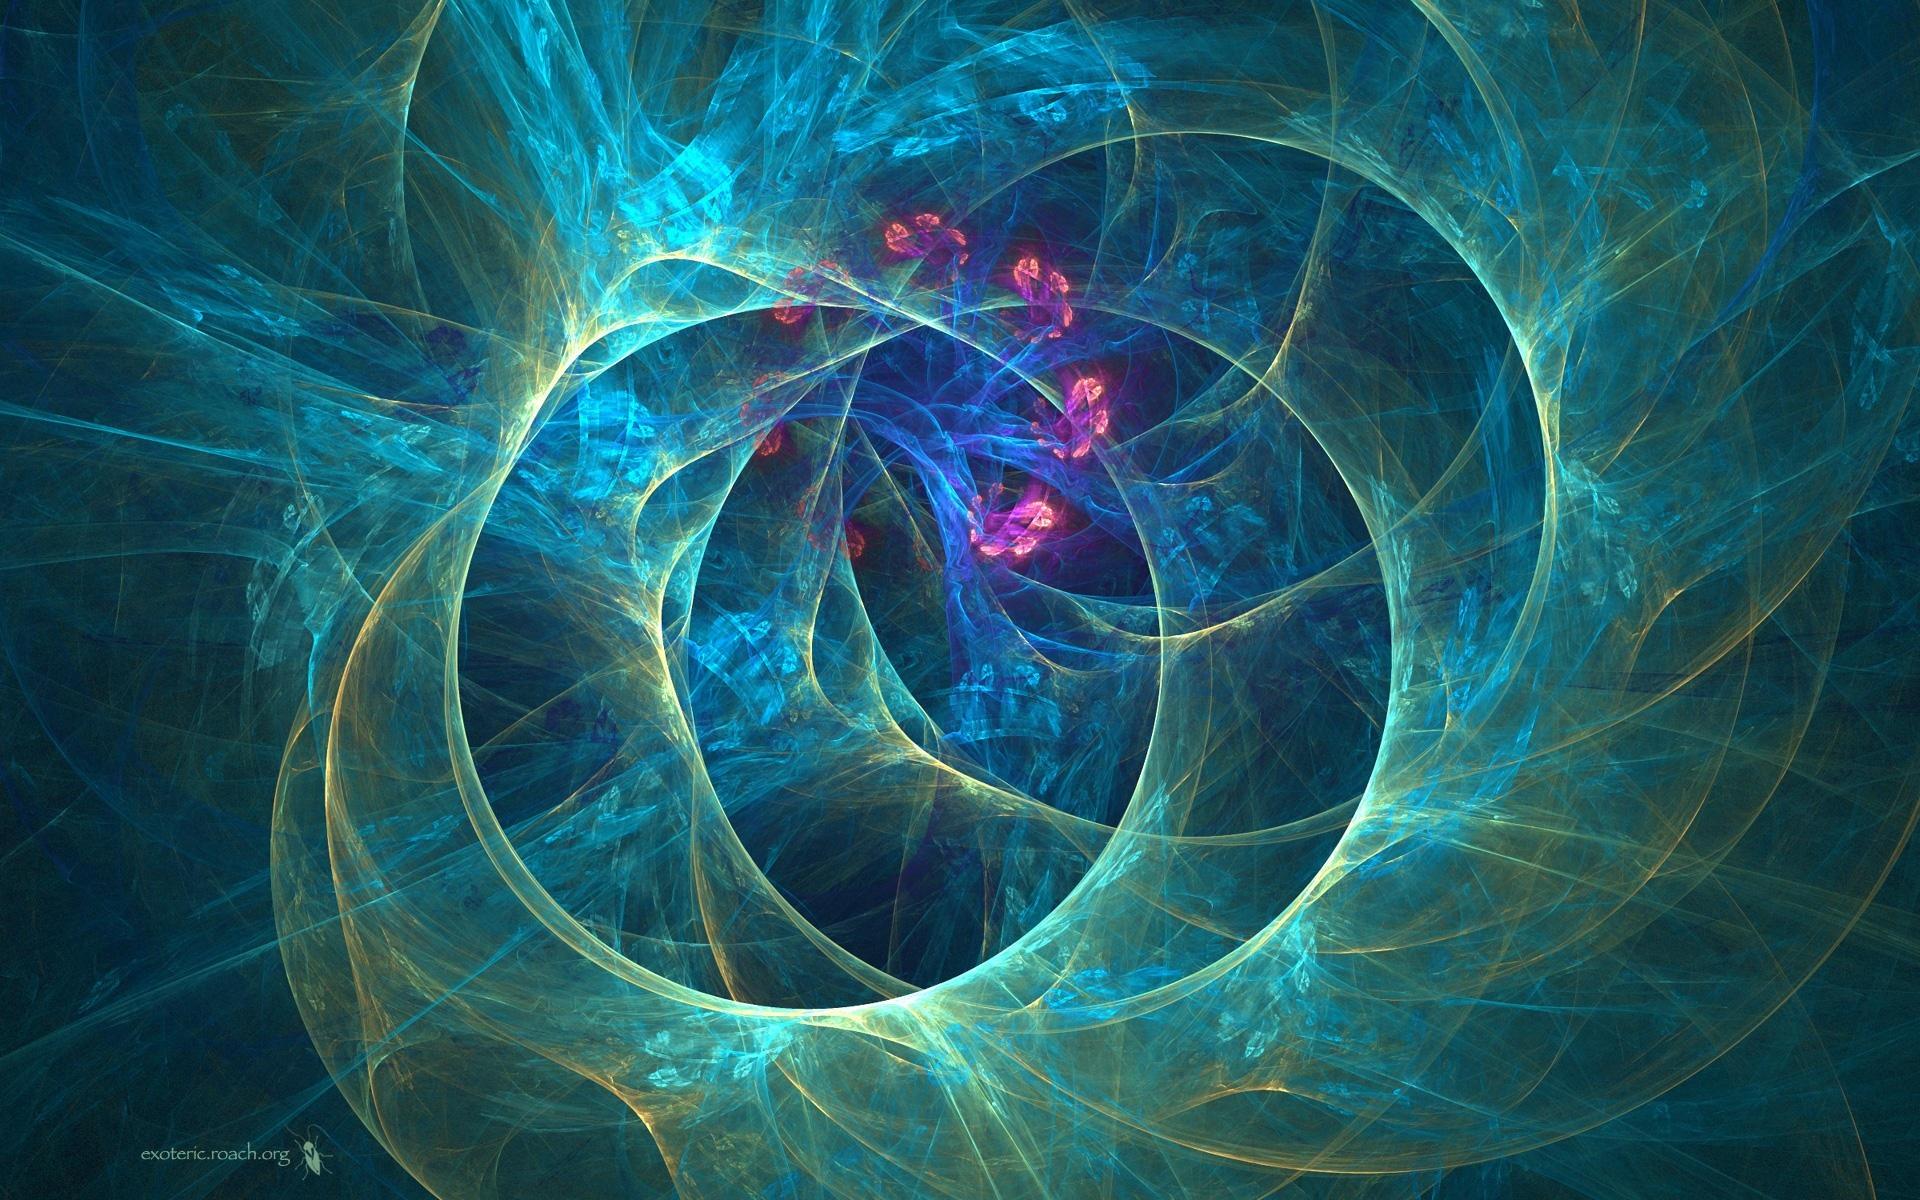 sacred-grove-background-fractal-art-174698